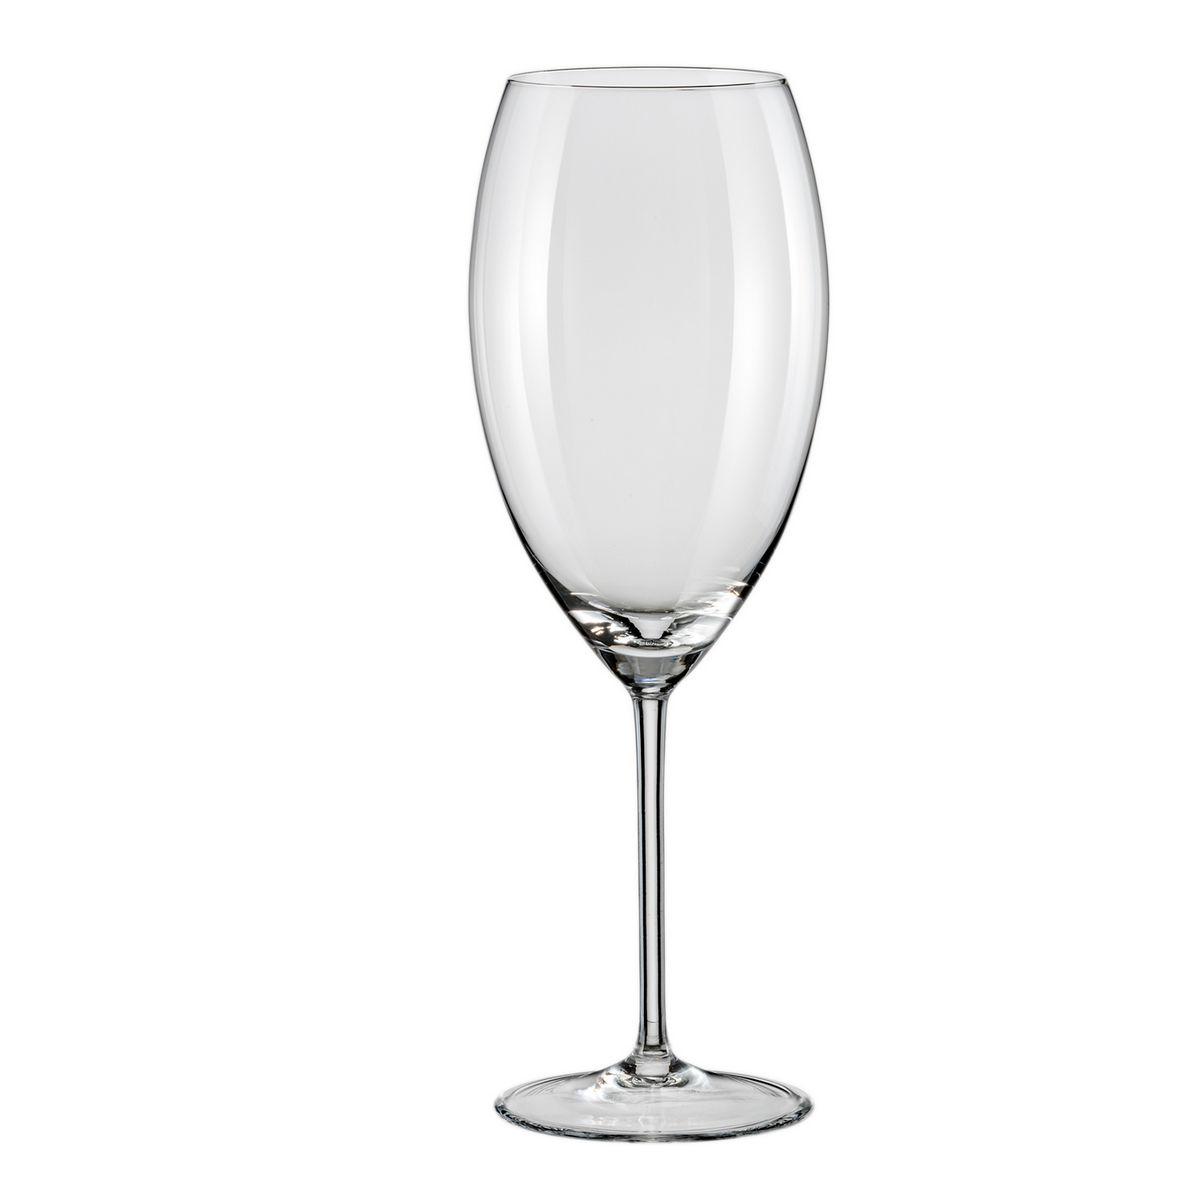 Grandioso Set 2 Pahare Cristalin Vin 600 Ml 2021 aranjareamesei.ro